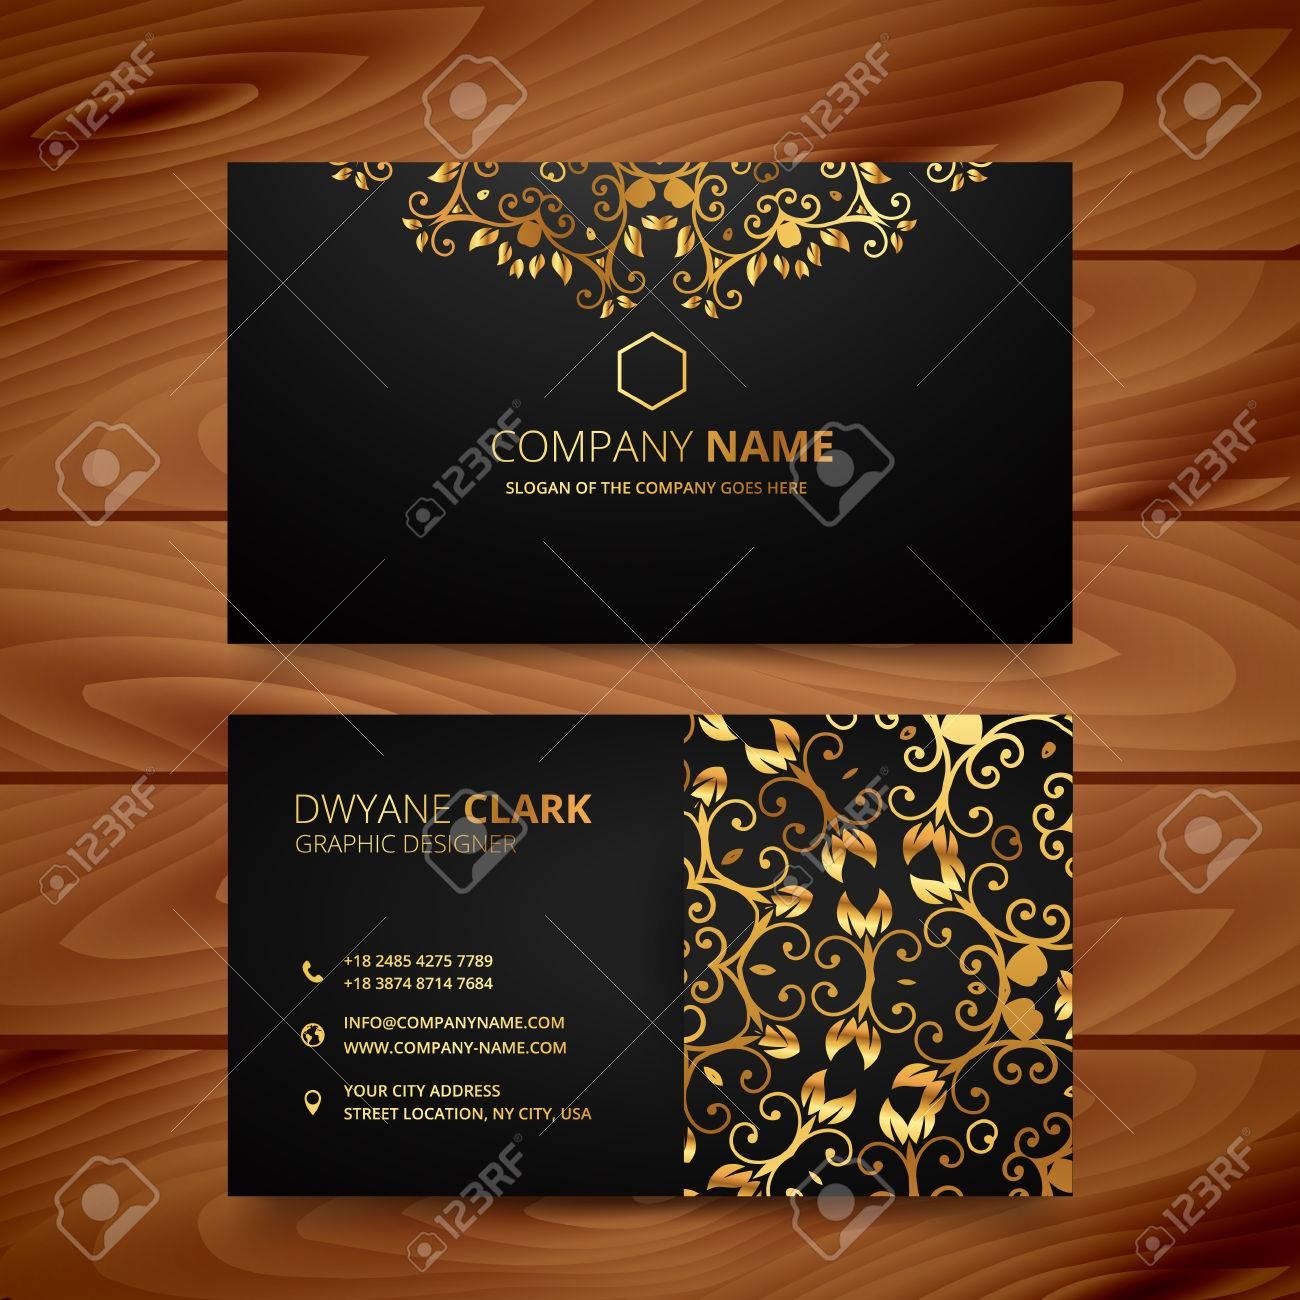 stylish golden premium luxury business card template design - 56177942